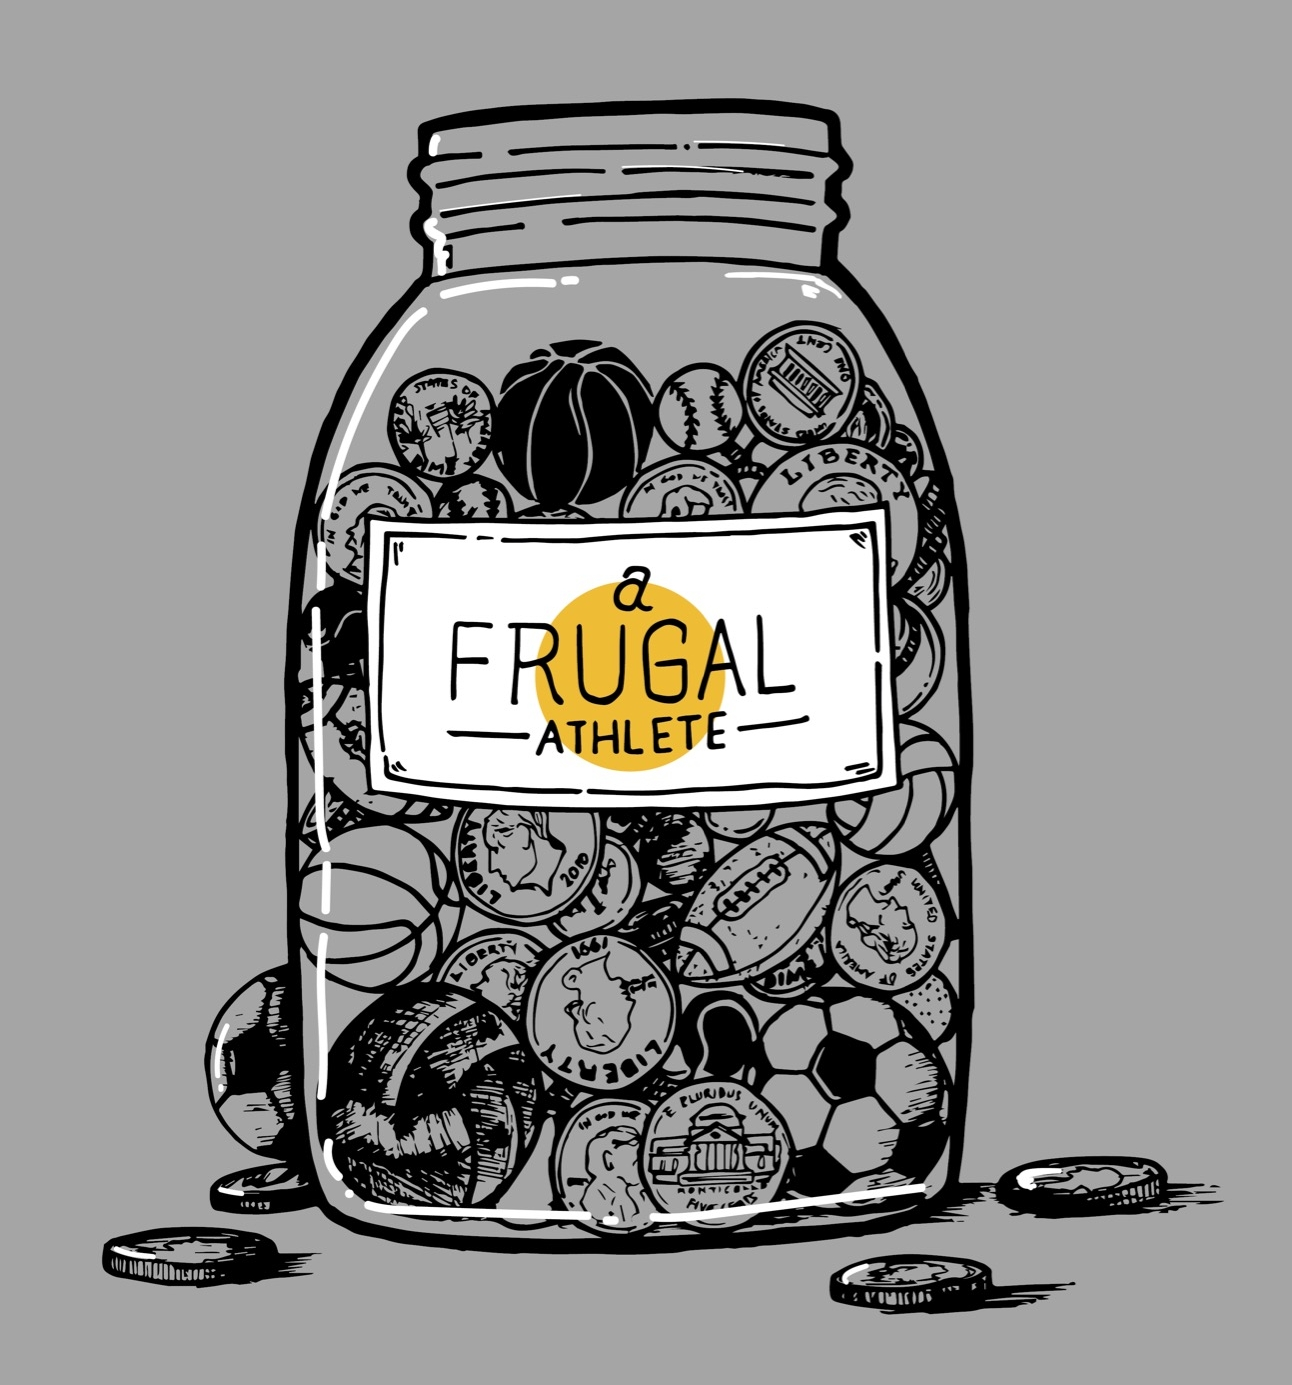 Frugal Athlete